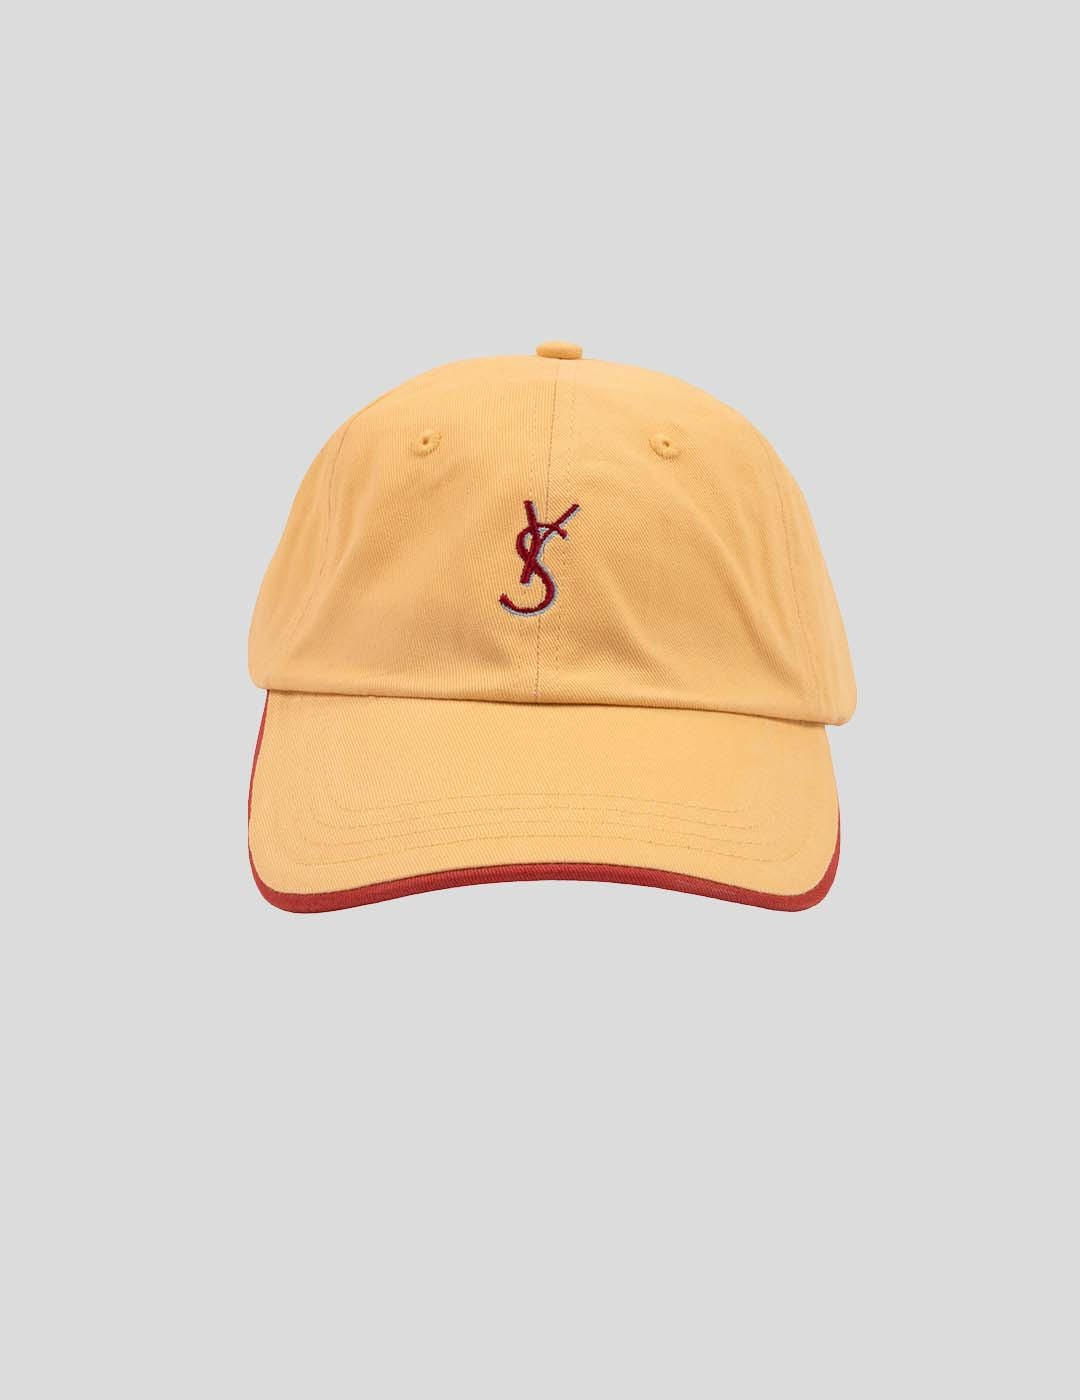 GORRA YARDSALE 2TONE CAP ORANGE /RED